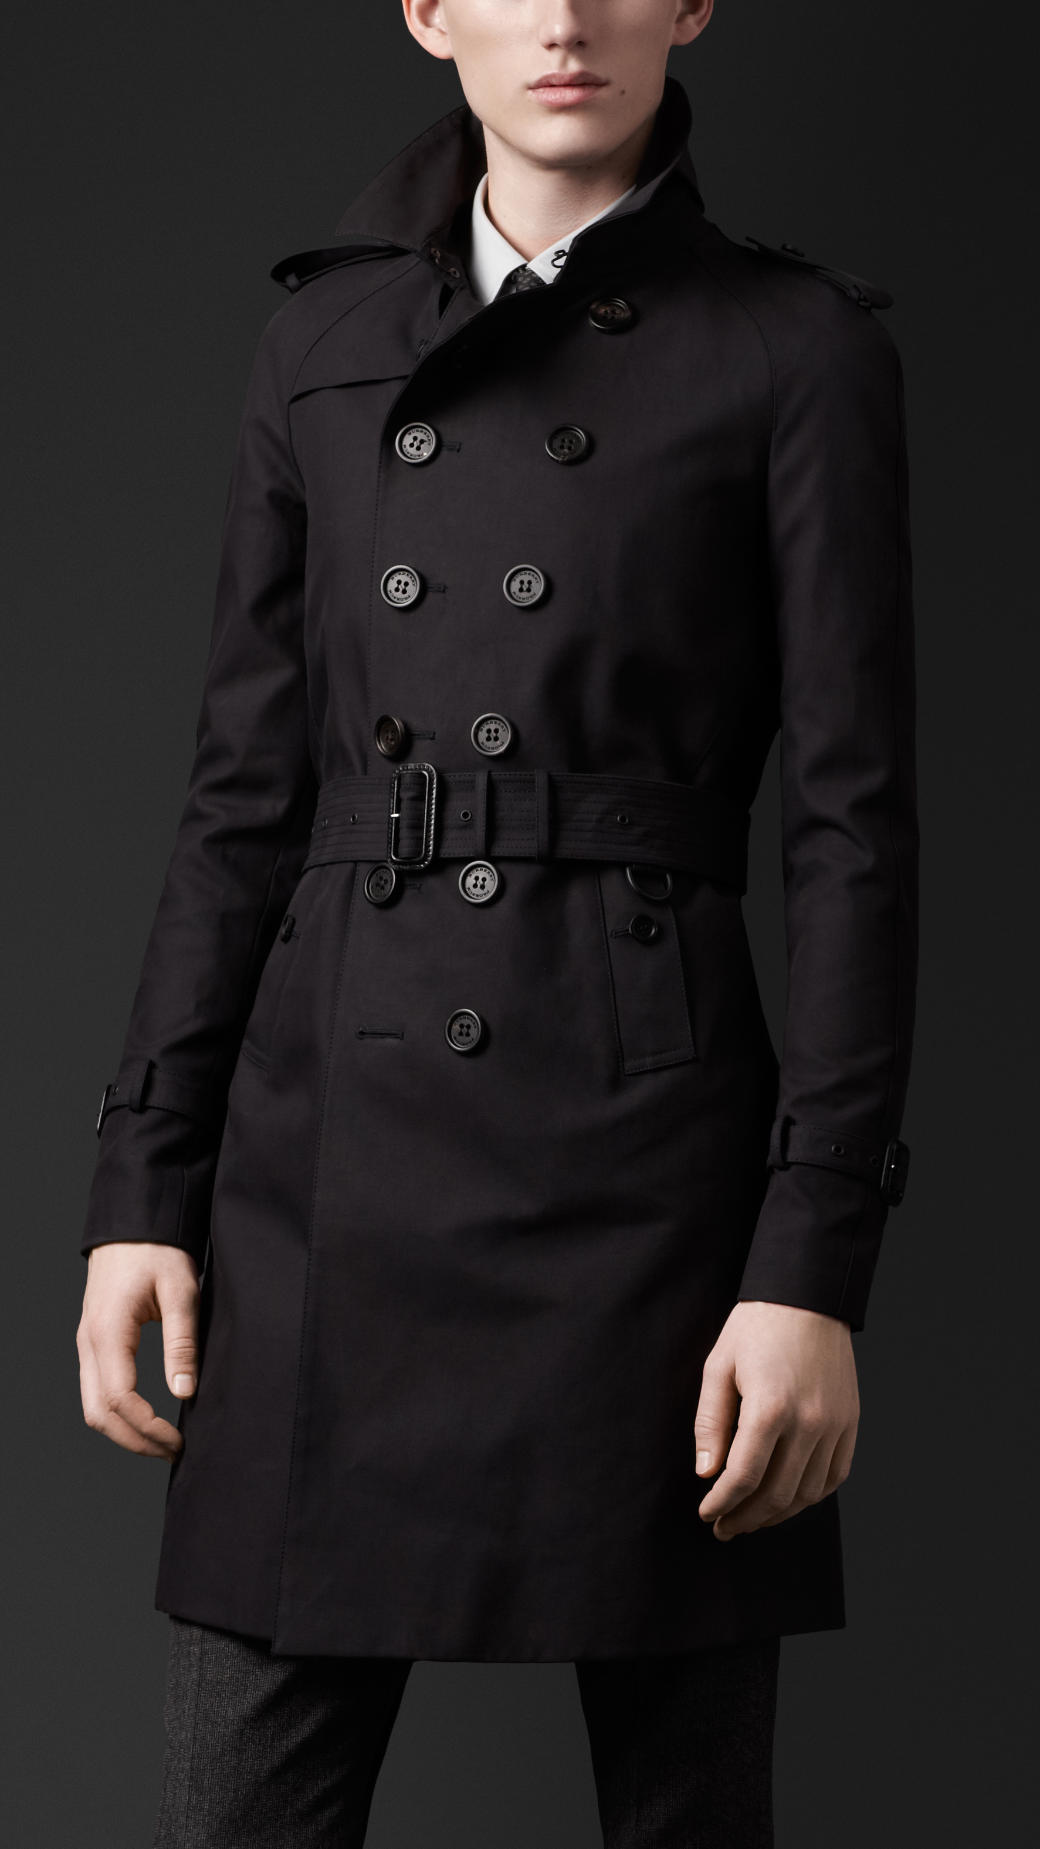 5288929ea791 Lyst Burberry For Cotton Sateen Black Coat Prorsum Men Trench In 1U8xwUn